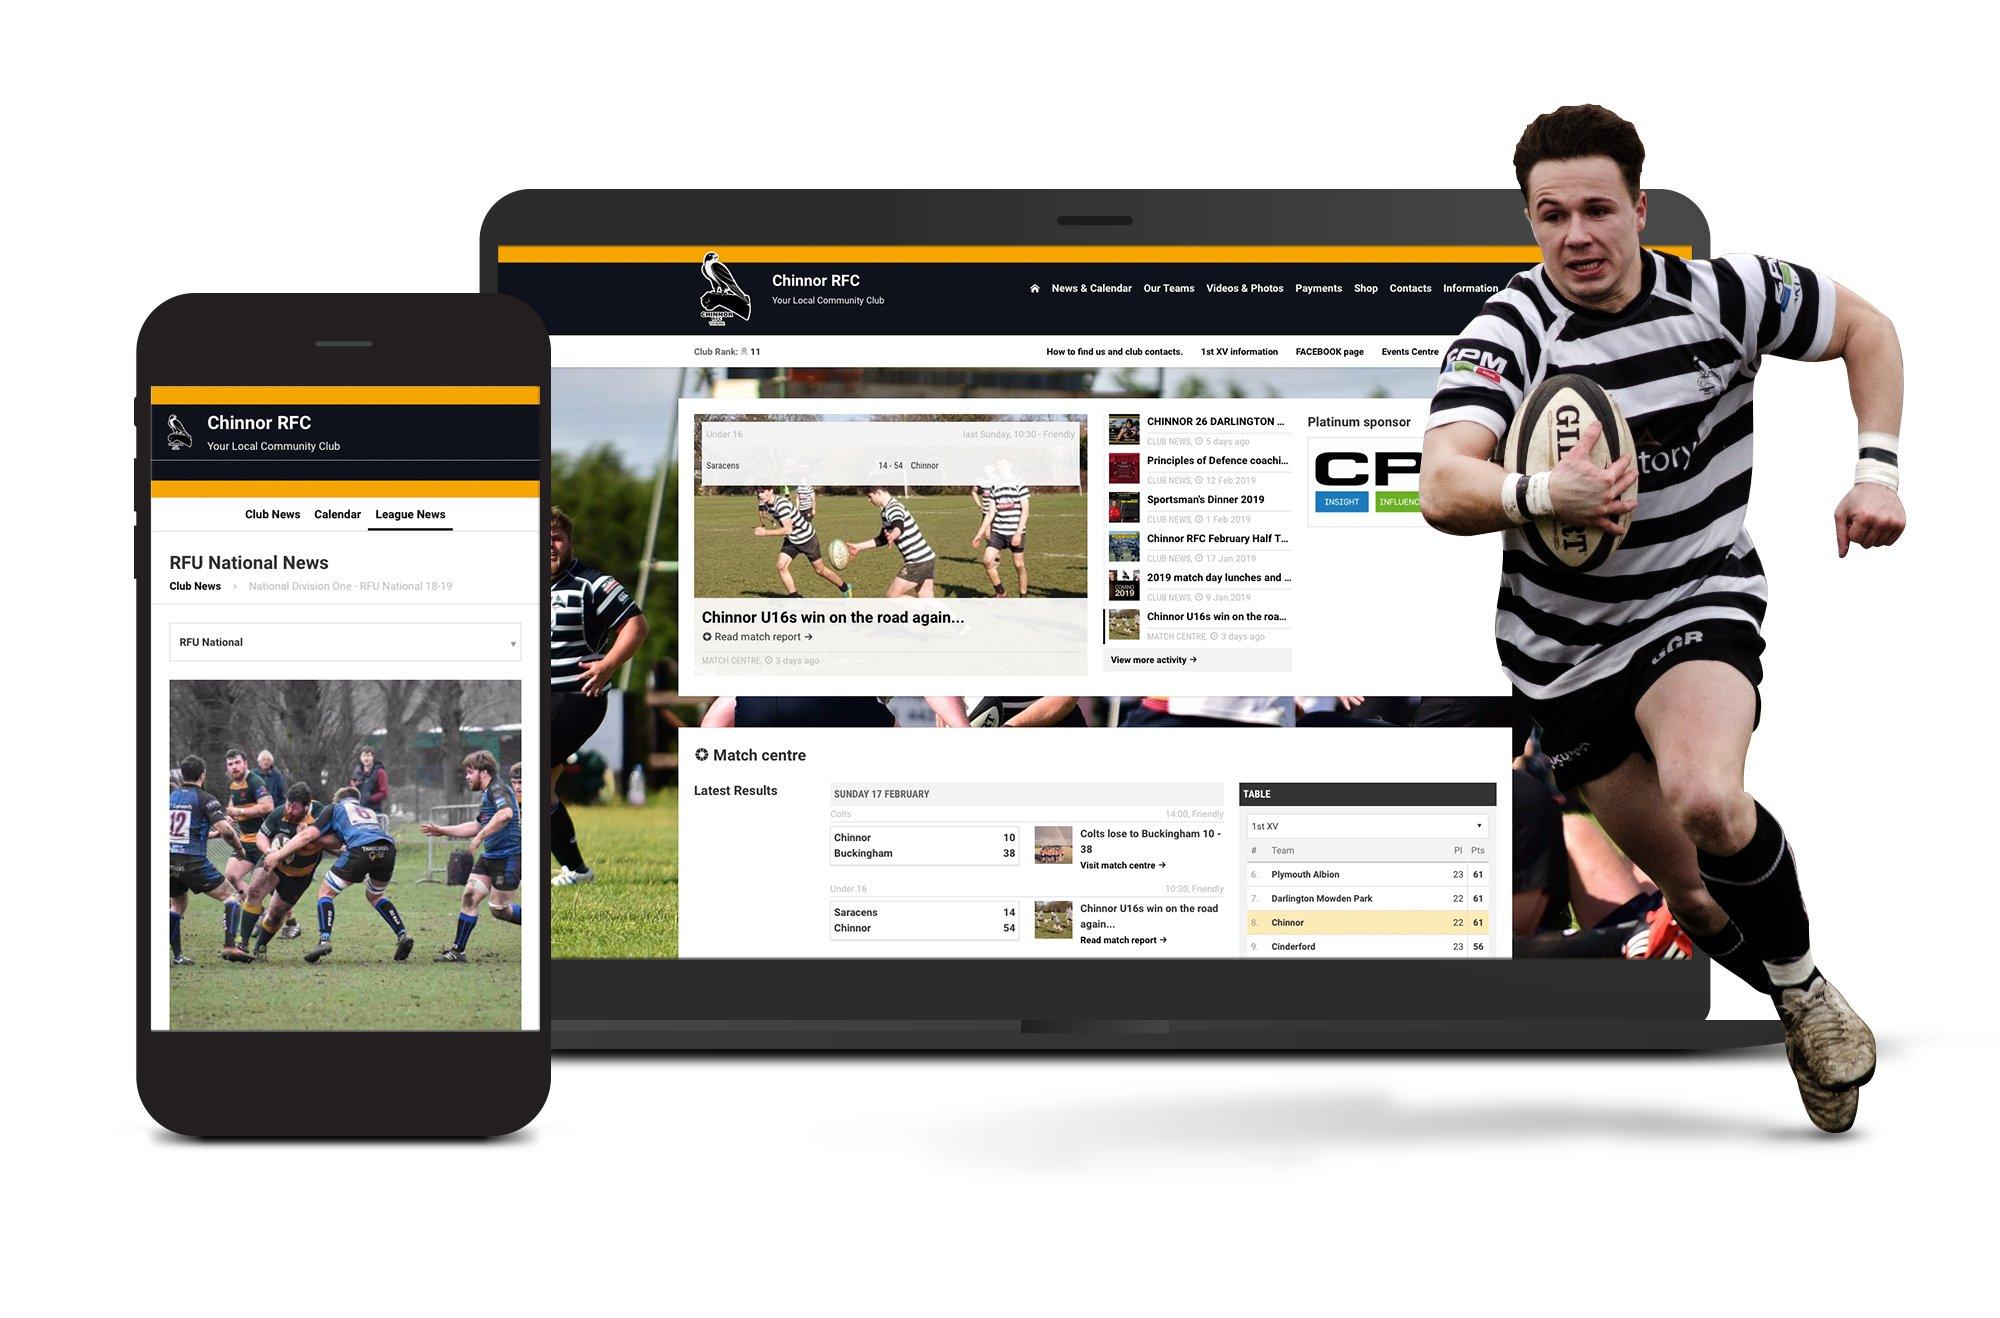 Chinnock RFC Website